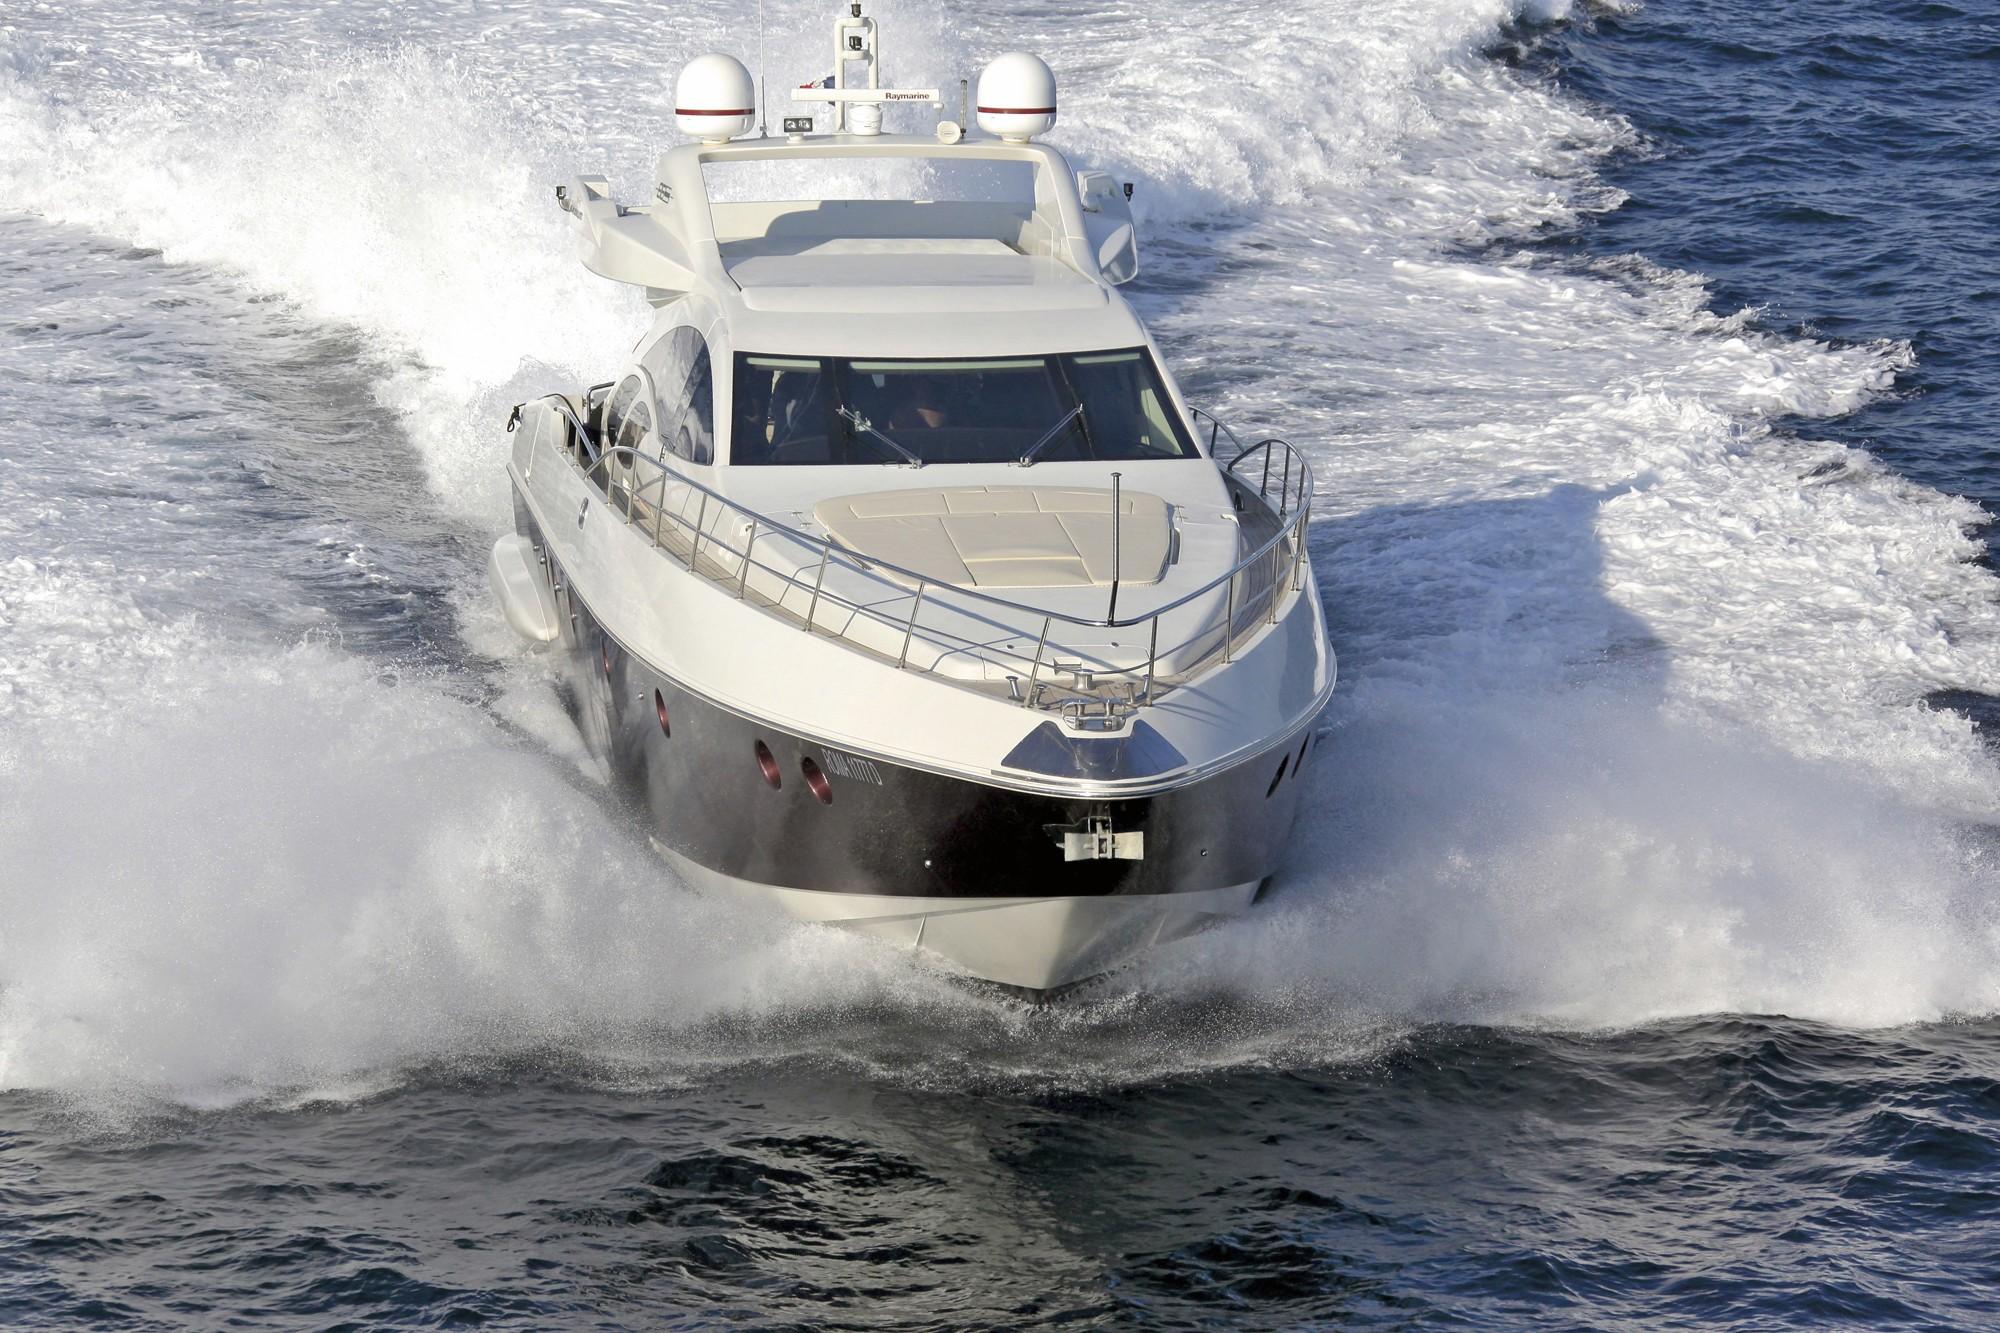 The 26m Yacht MR LOUIS